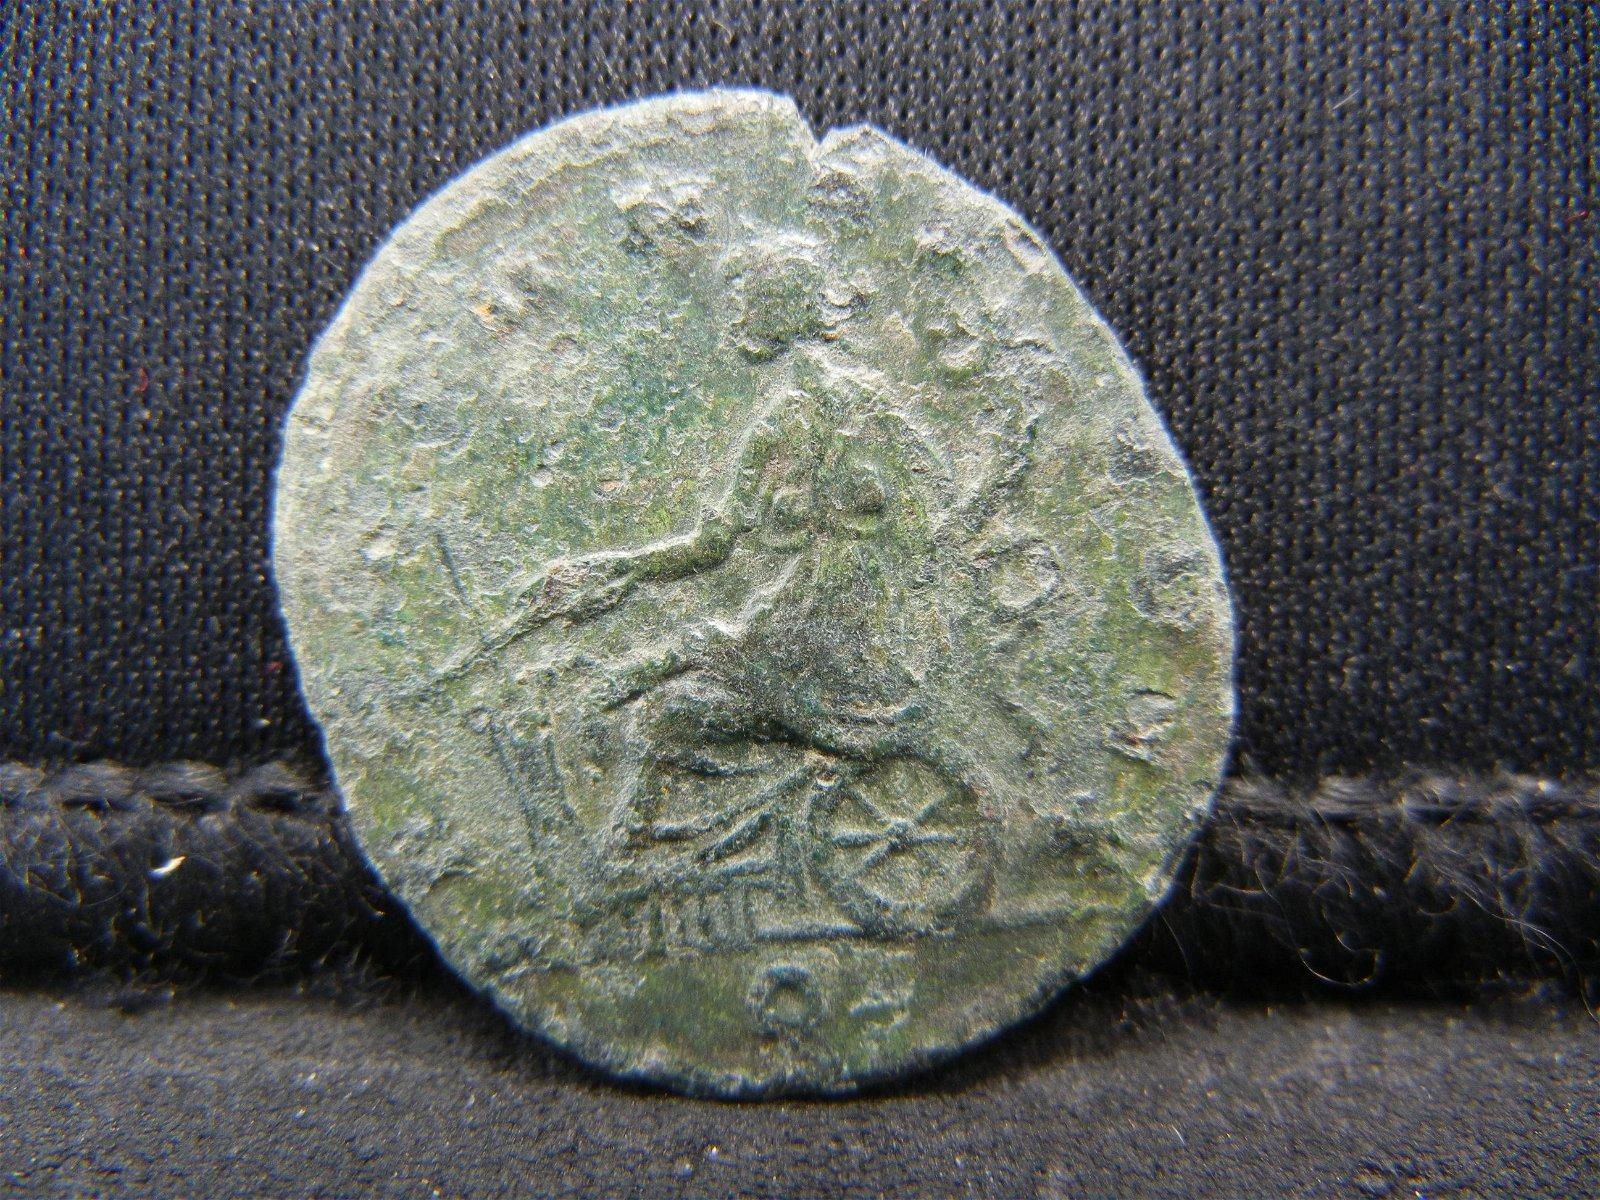 175-330 AD ANCIENT ROMAN COIN